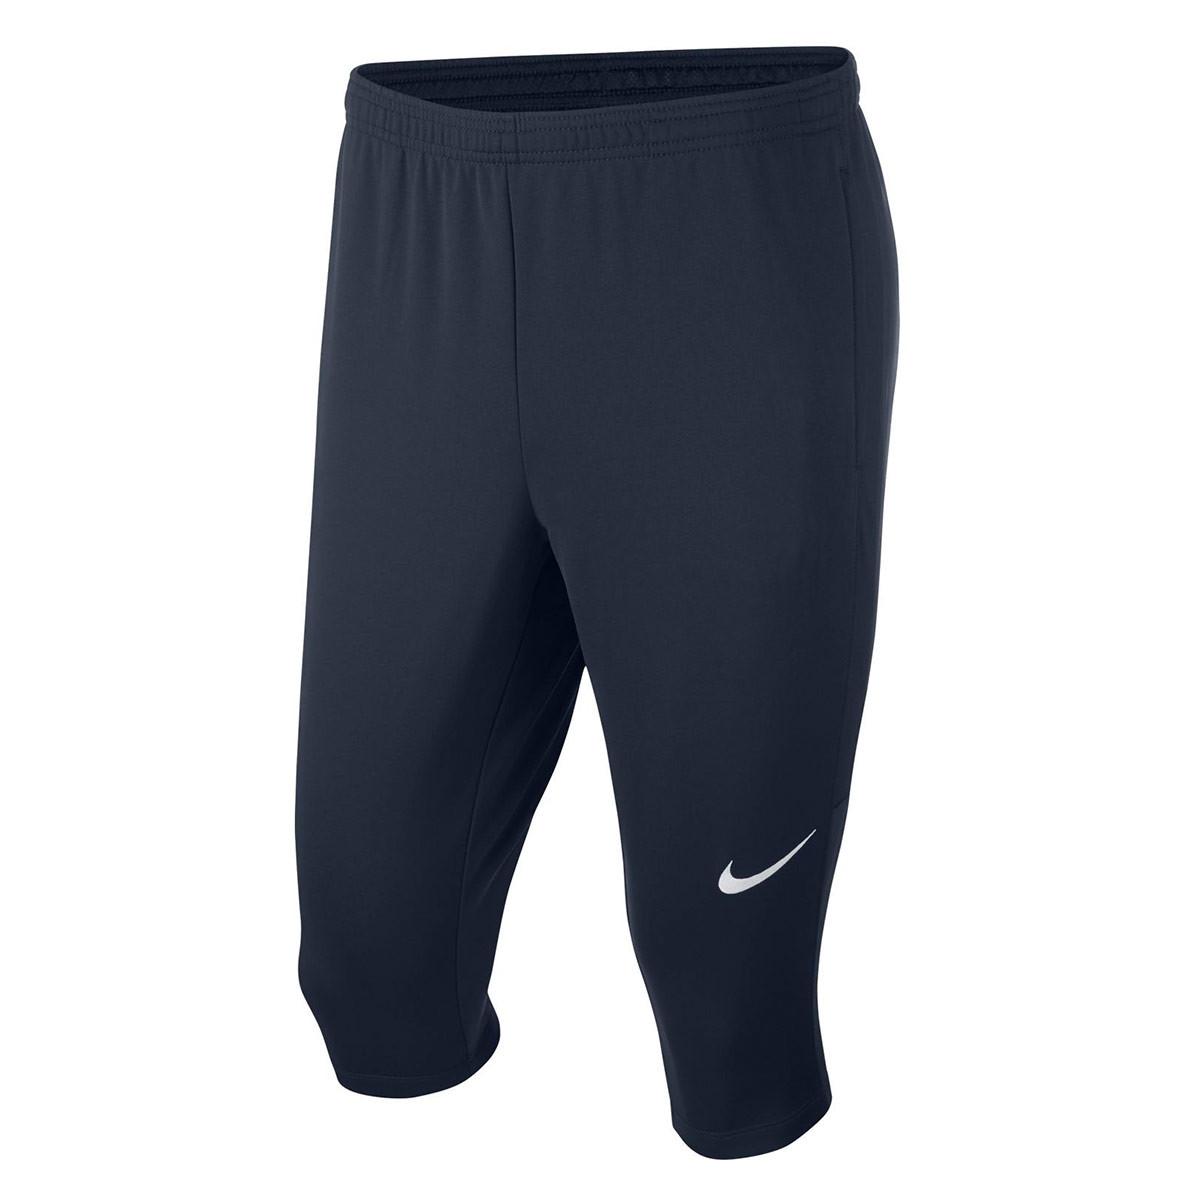 mostrar Regularmente Oclusión  Capri pants Nike Academy 18 Training Obsidian-White - Football store Fútbol  Emotion